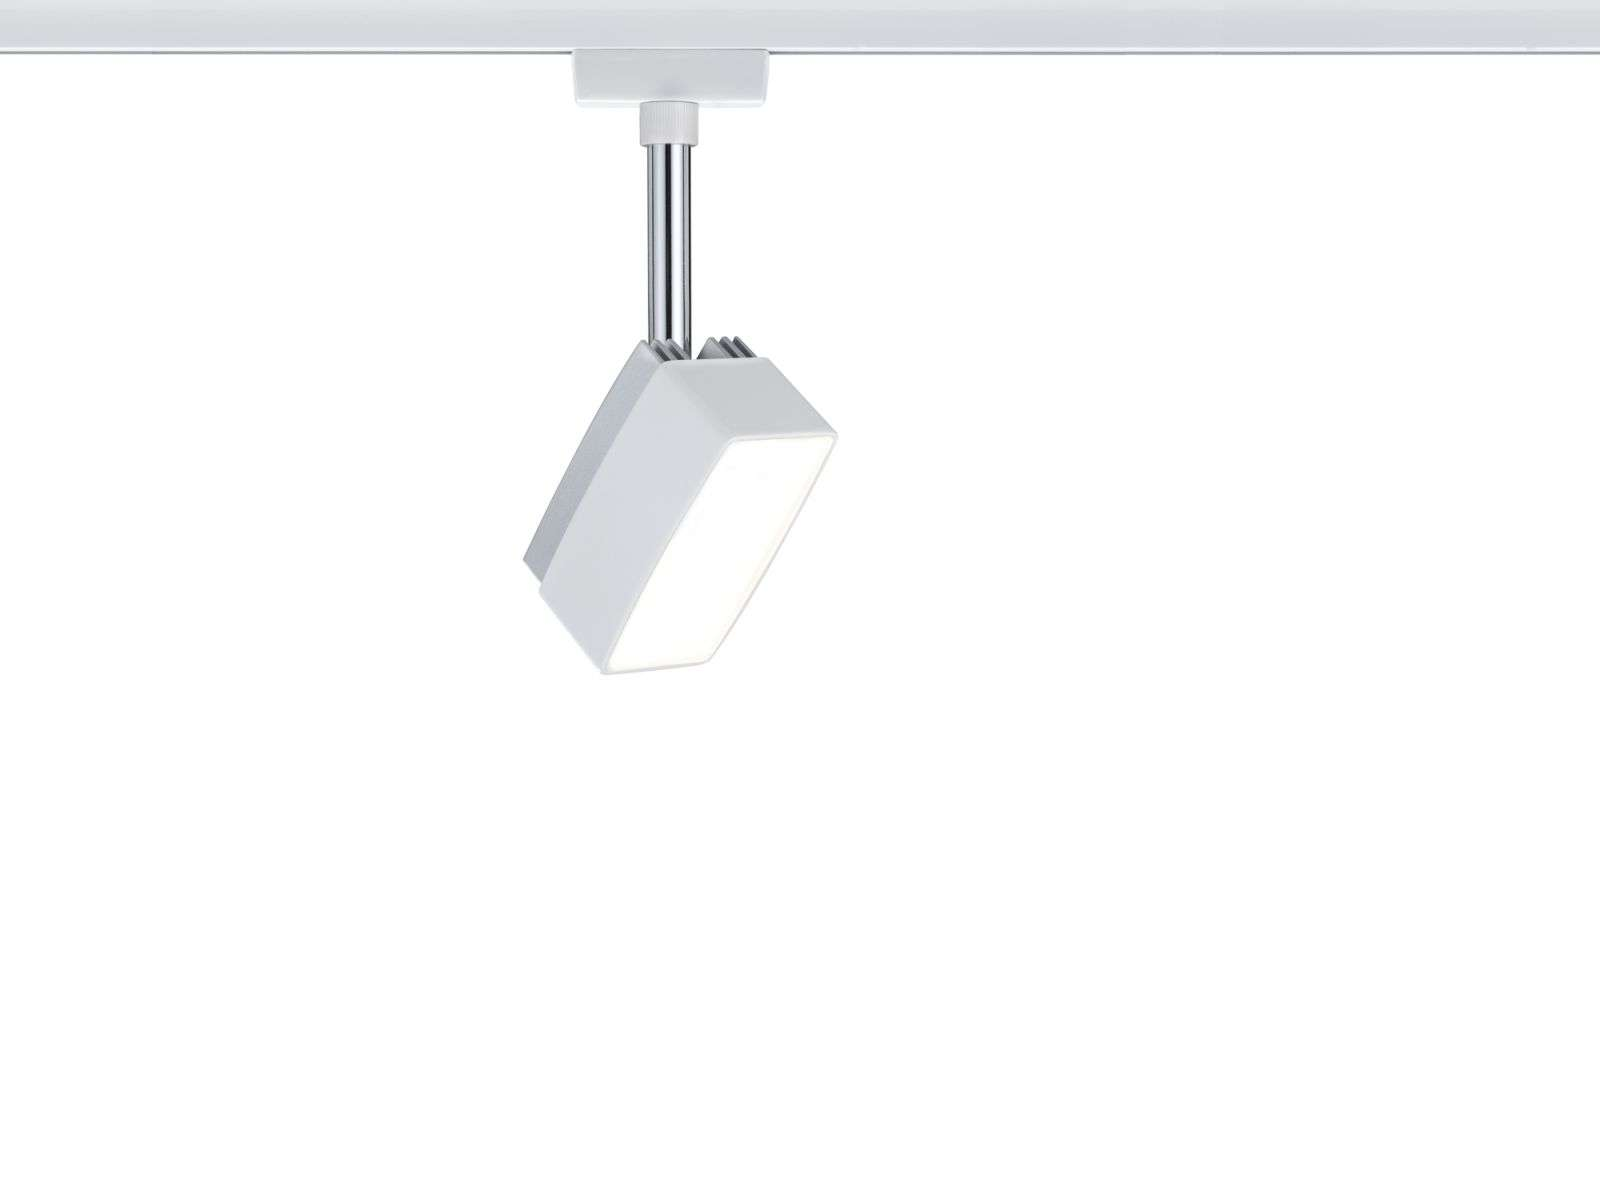 URail Systemleuchte Light/&Easy LED Spot Quad 1x3W GU10 Chrom matt//Weiß 230V Meta